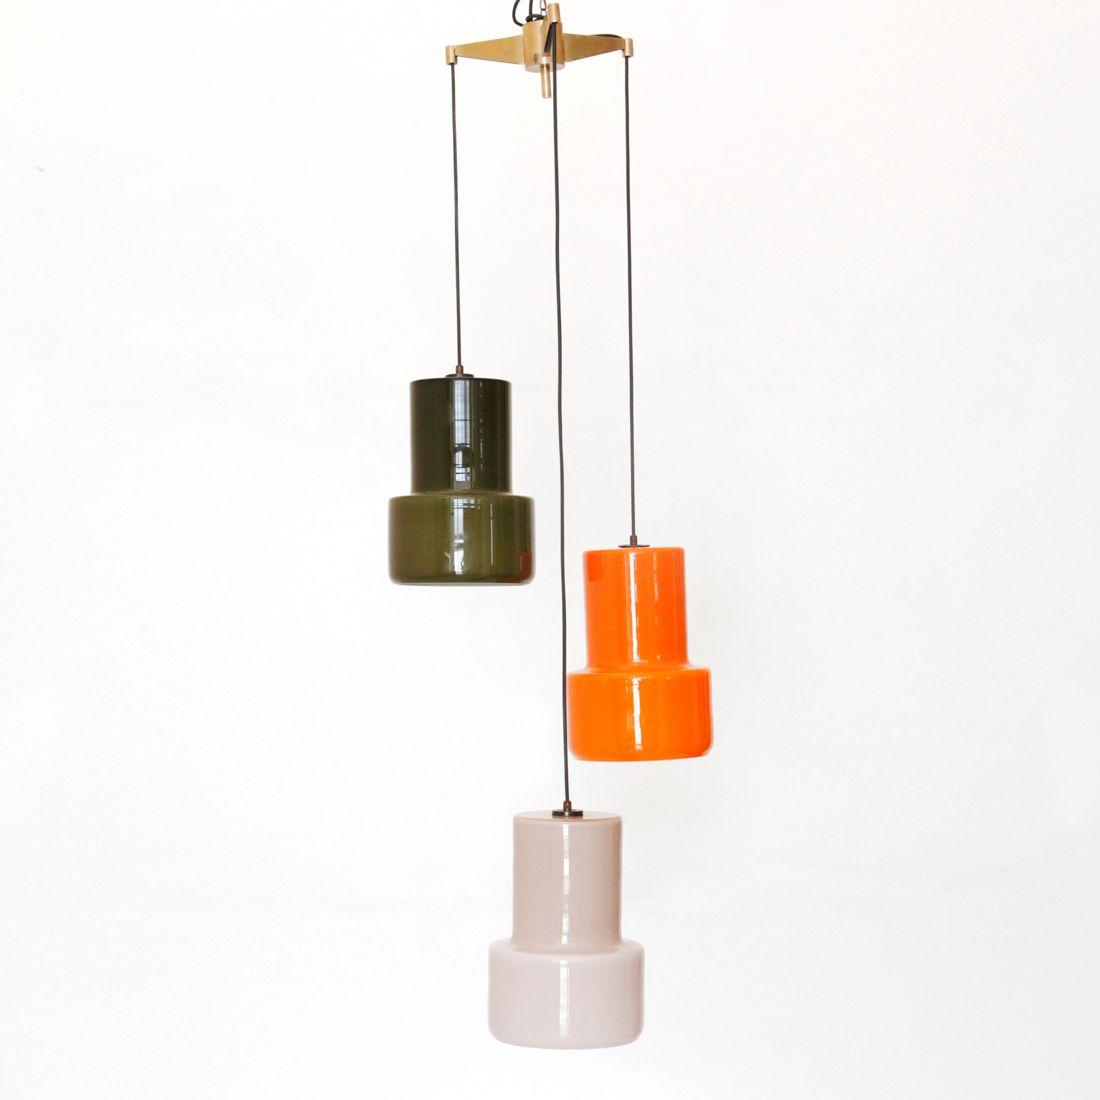 Italian Murano Glass Pendant Lamp From Vistosi 1950s For